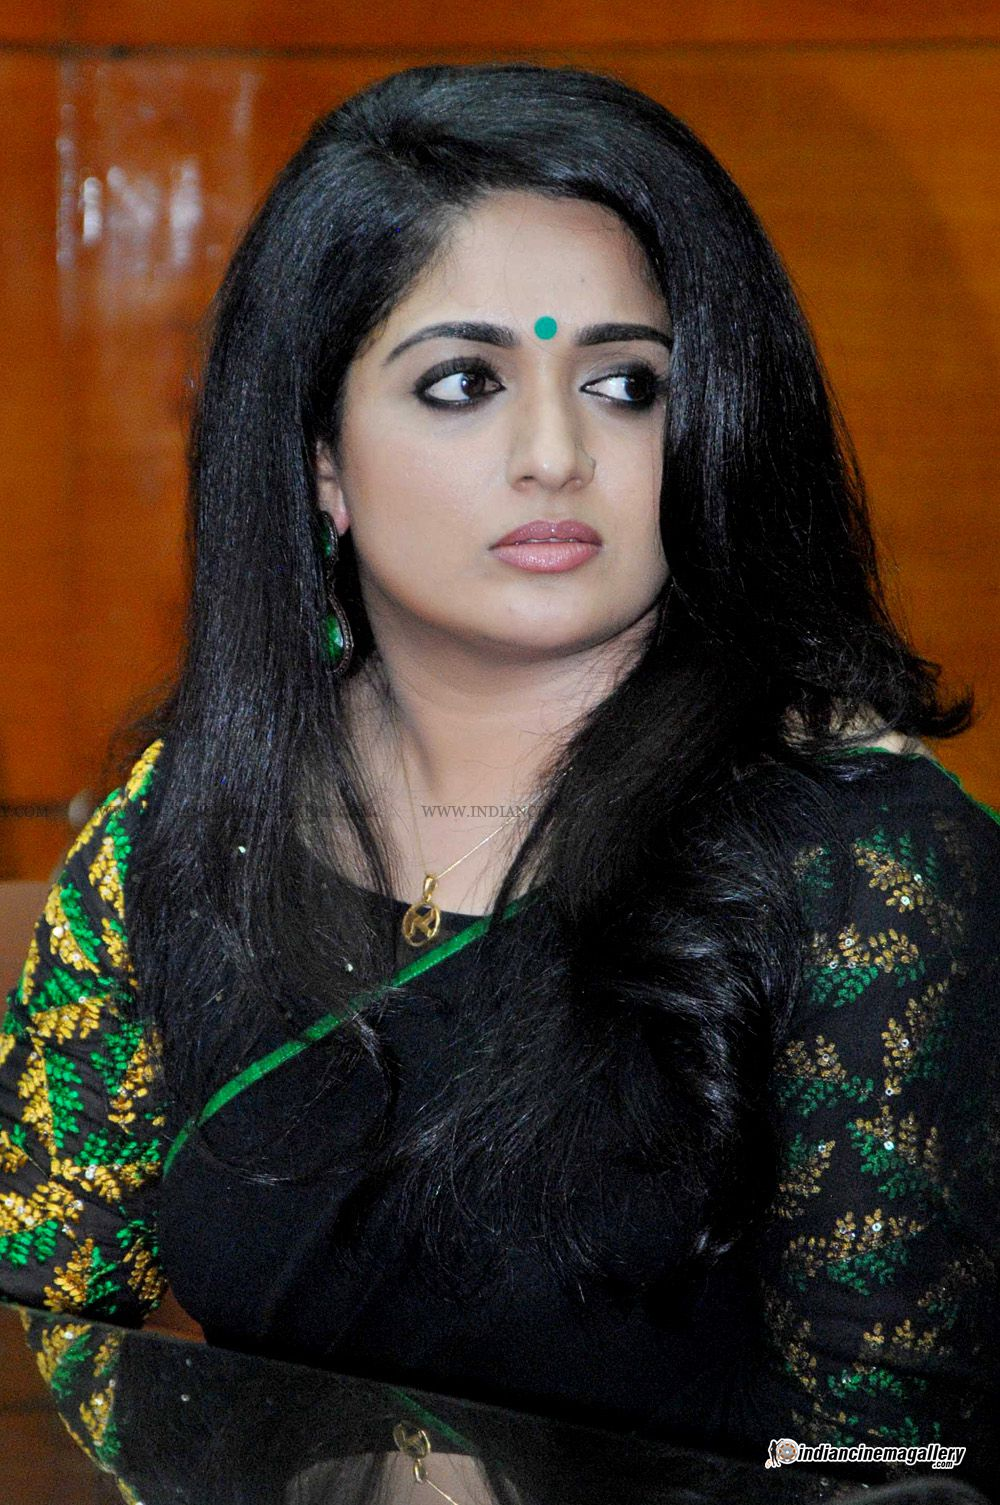 Naked Kavya Madhavan 89 Pictures Paparazzi, Youtube-9073